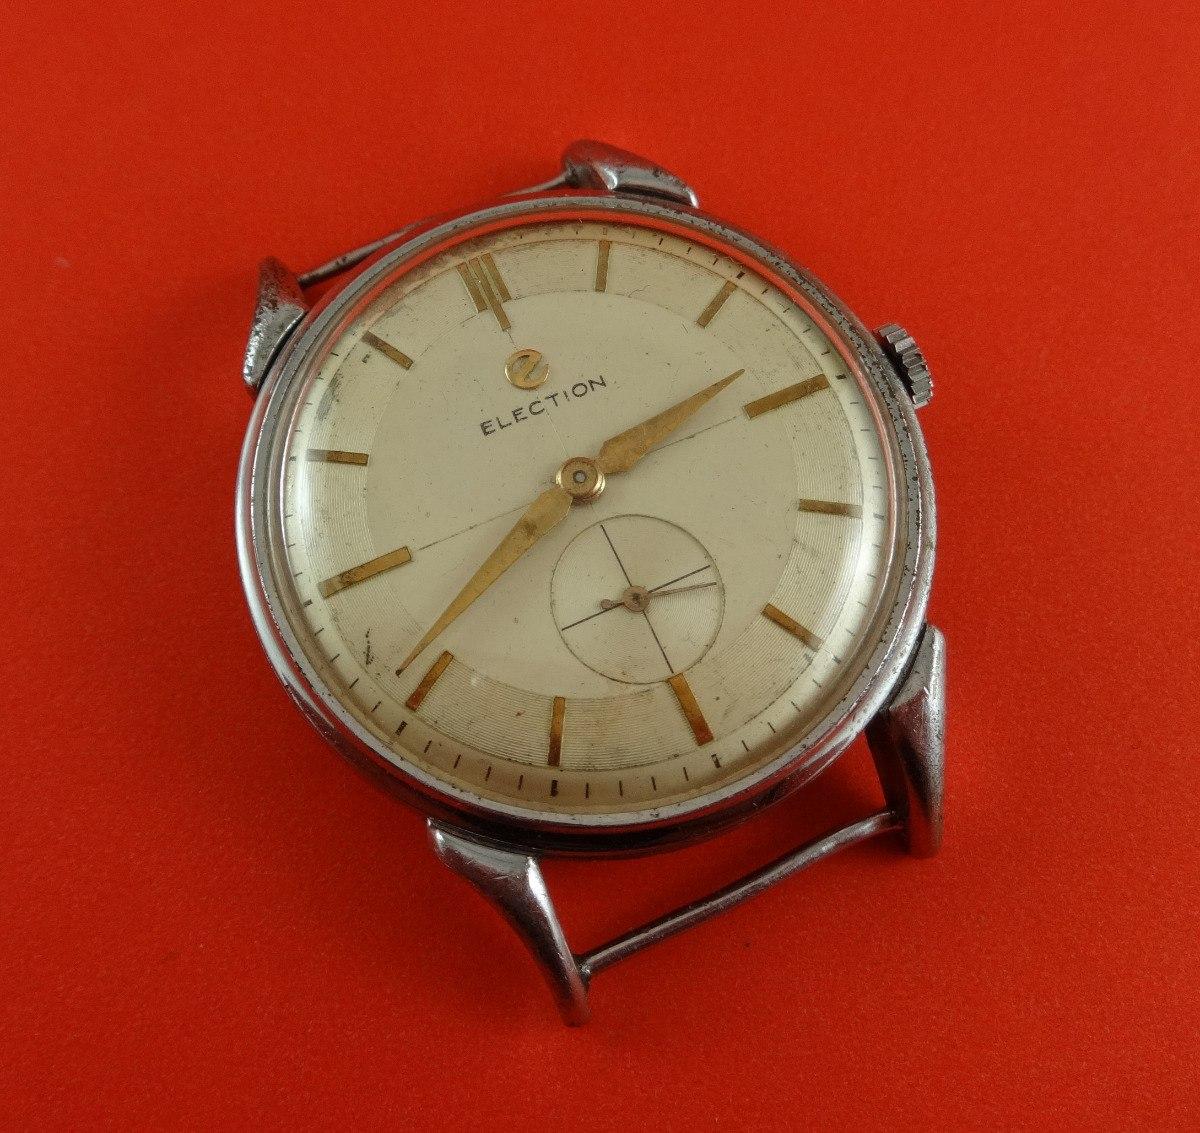 Manual Reloj Caja 35mm Cuerda Restaurar900 Para Election Cal645 00 kiOZPXu